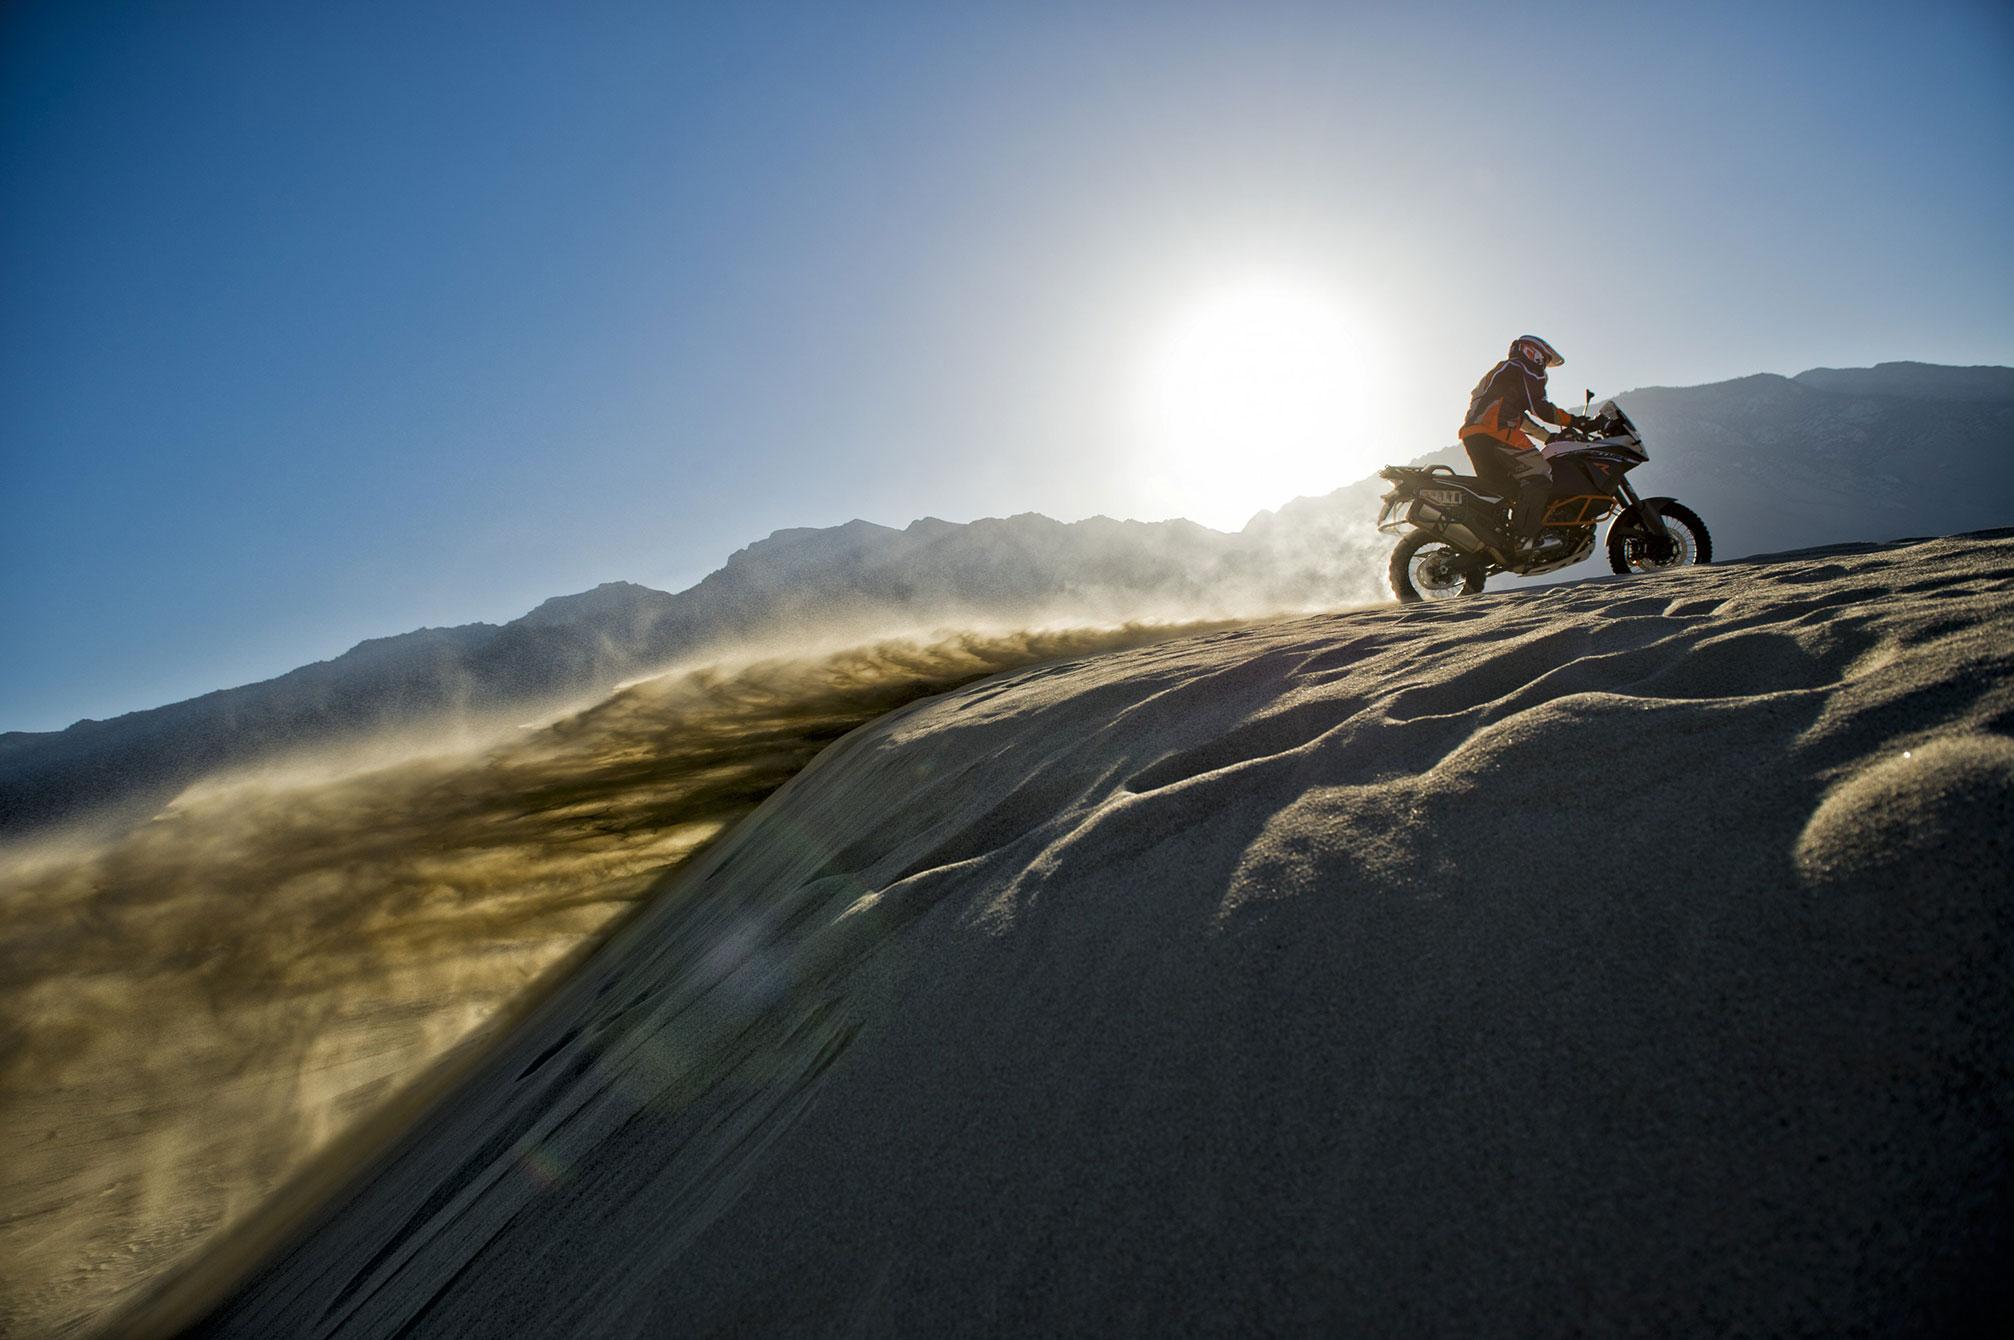 Ktm Motocross Wallpaper Hd Download Free Adventure Background Pixelstalk Net